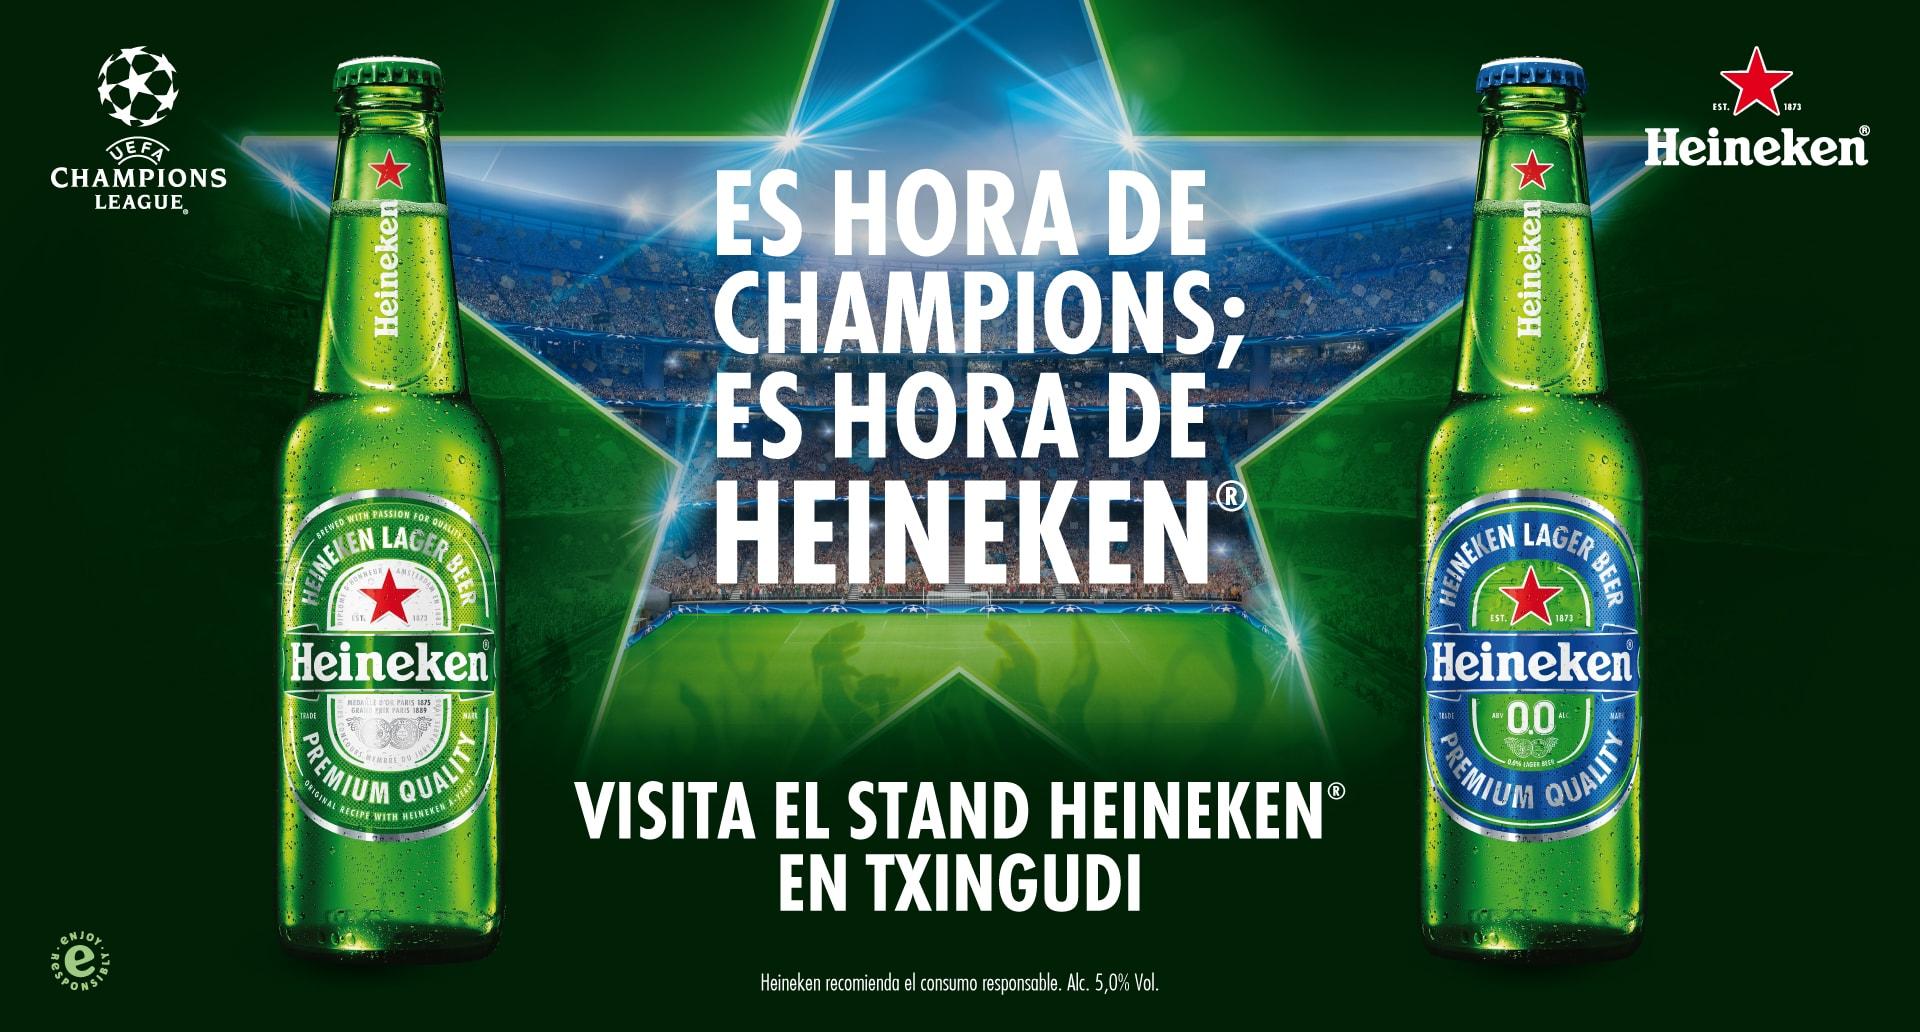 Es hora de Champions; es hora de Heineken